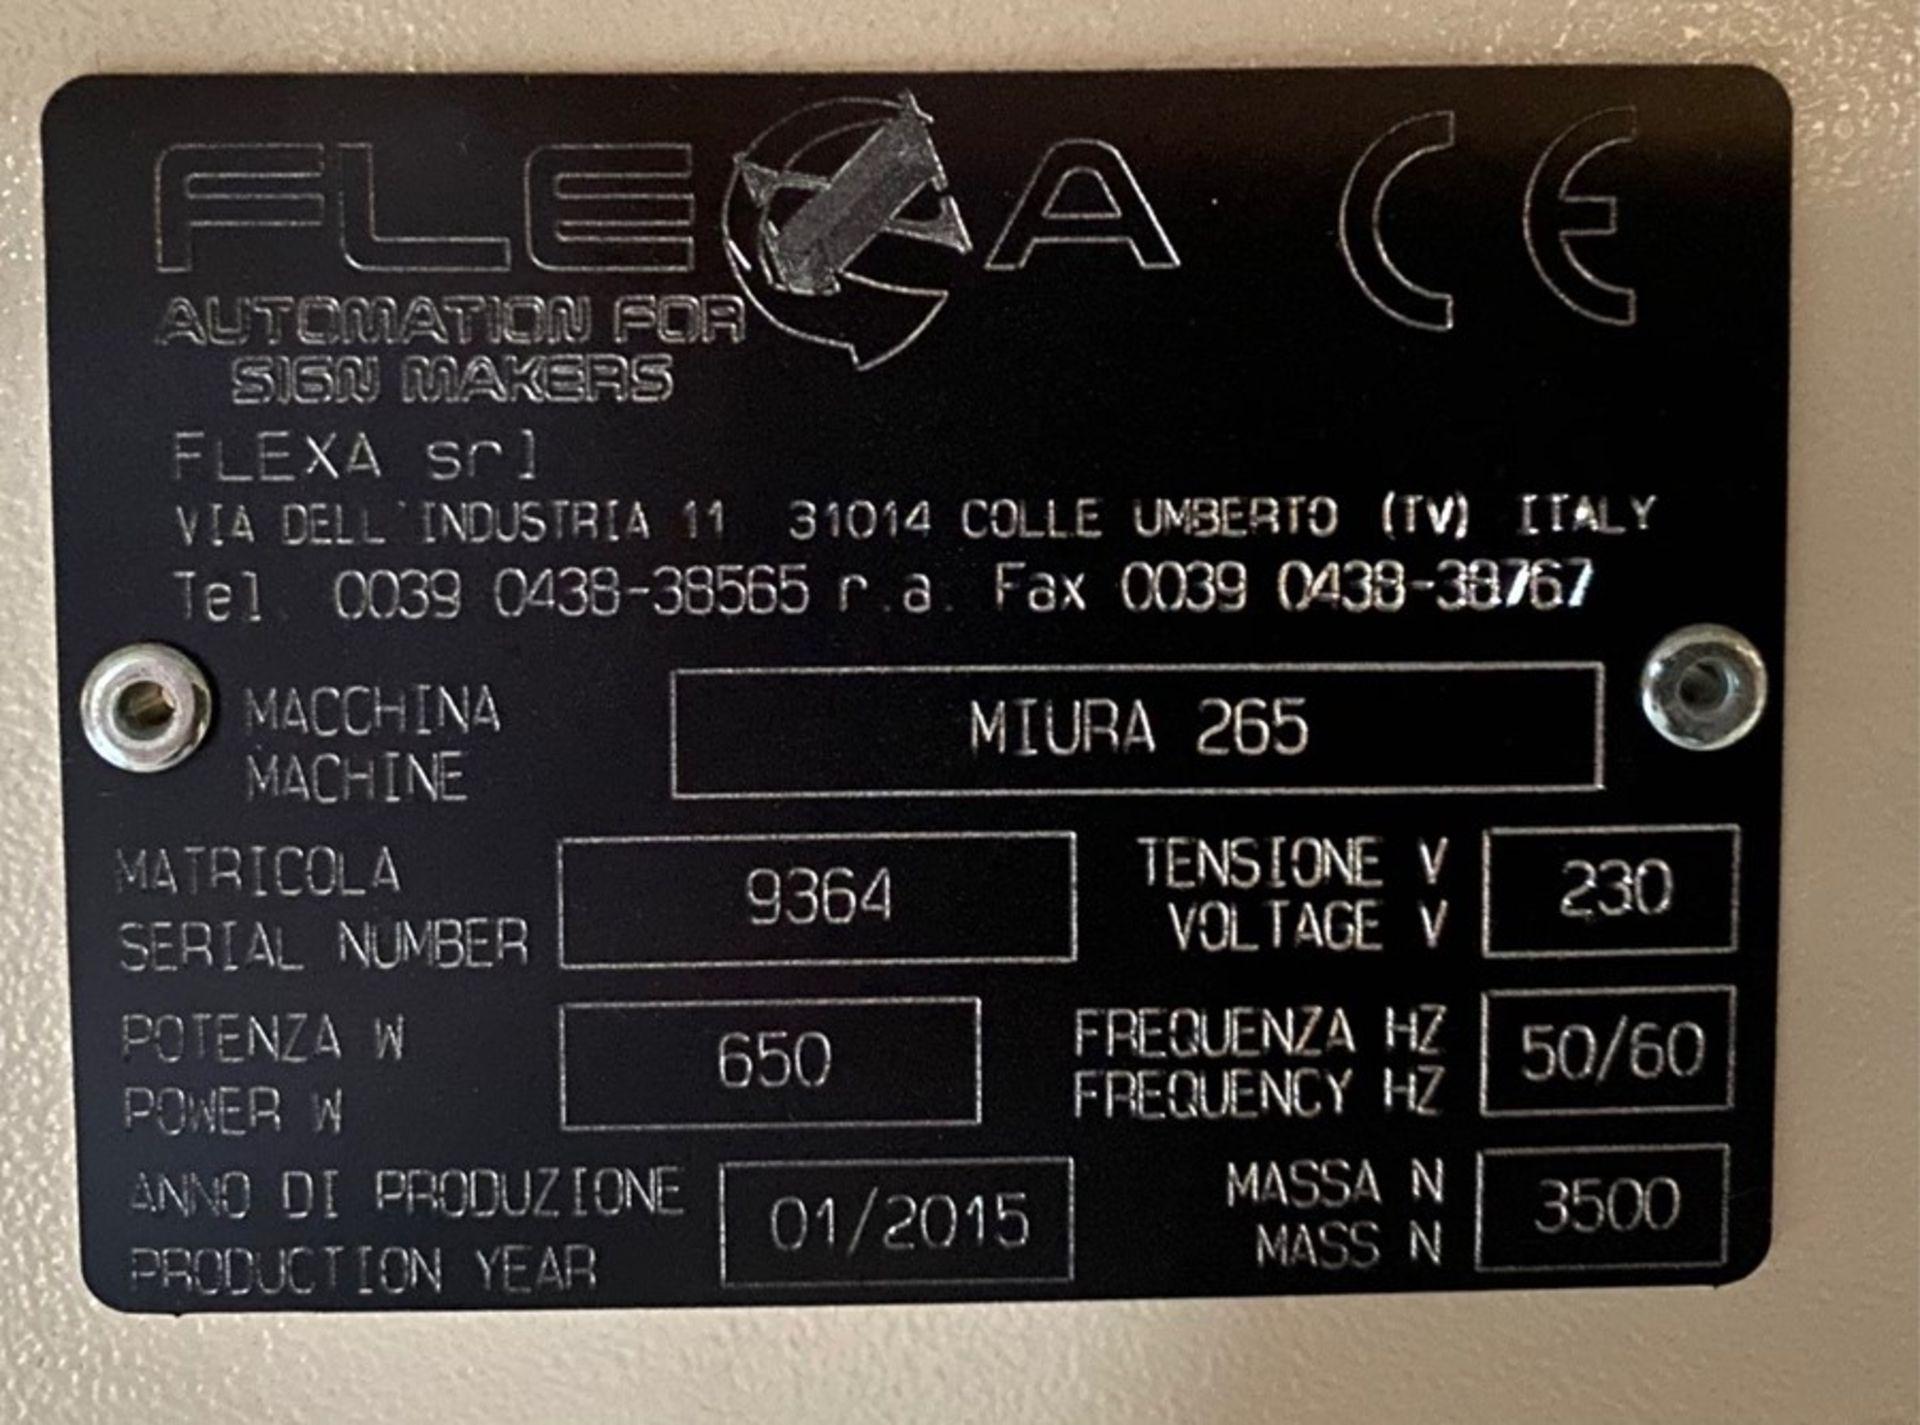 Flexa Miura II 265 X-Y Cutter (2015) - Image 5 of 5